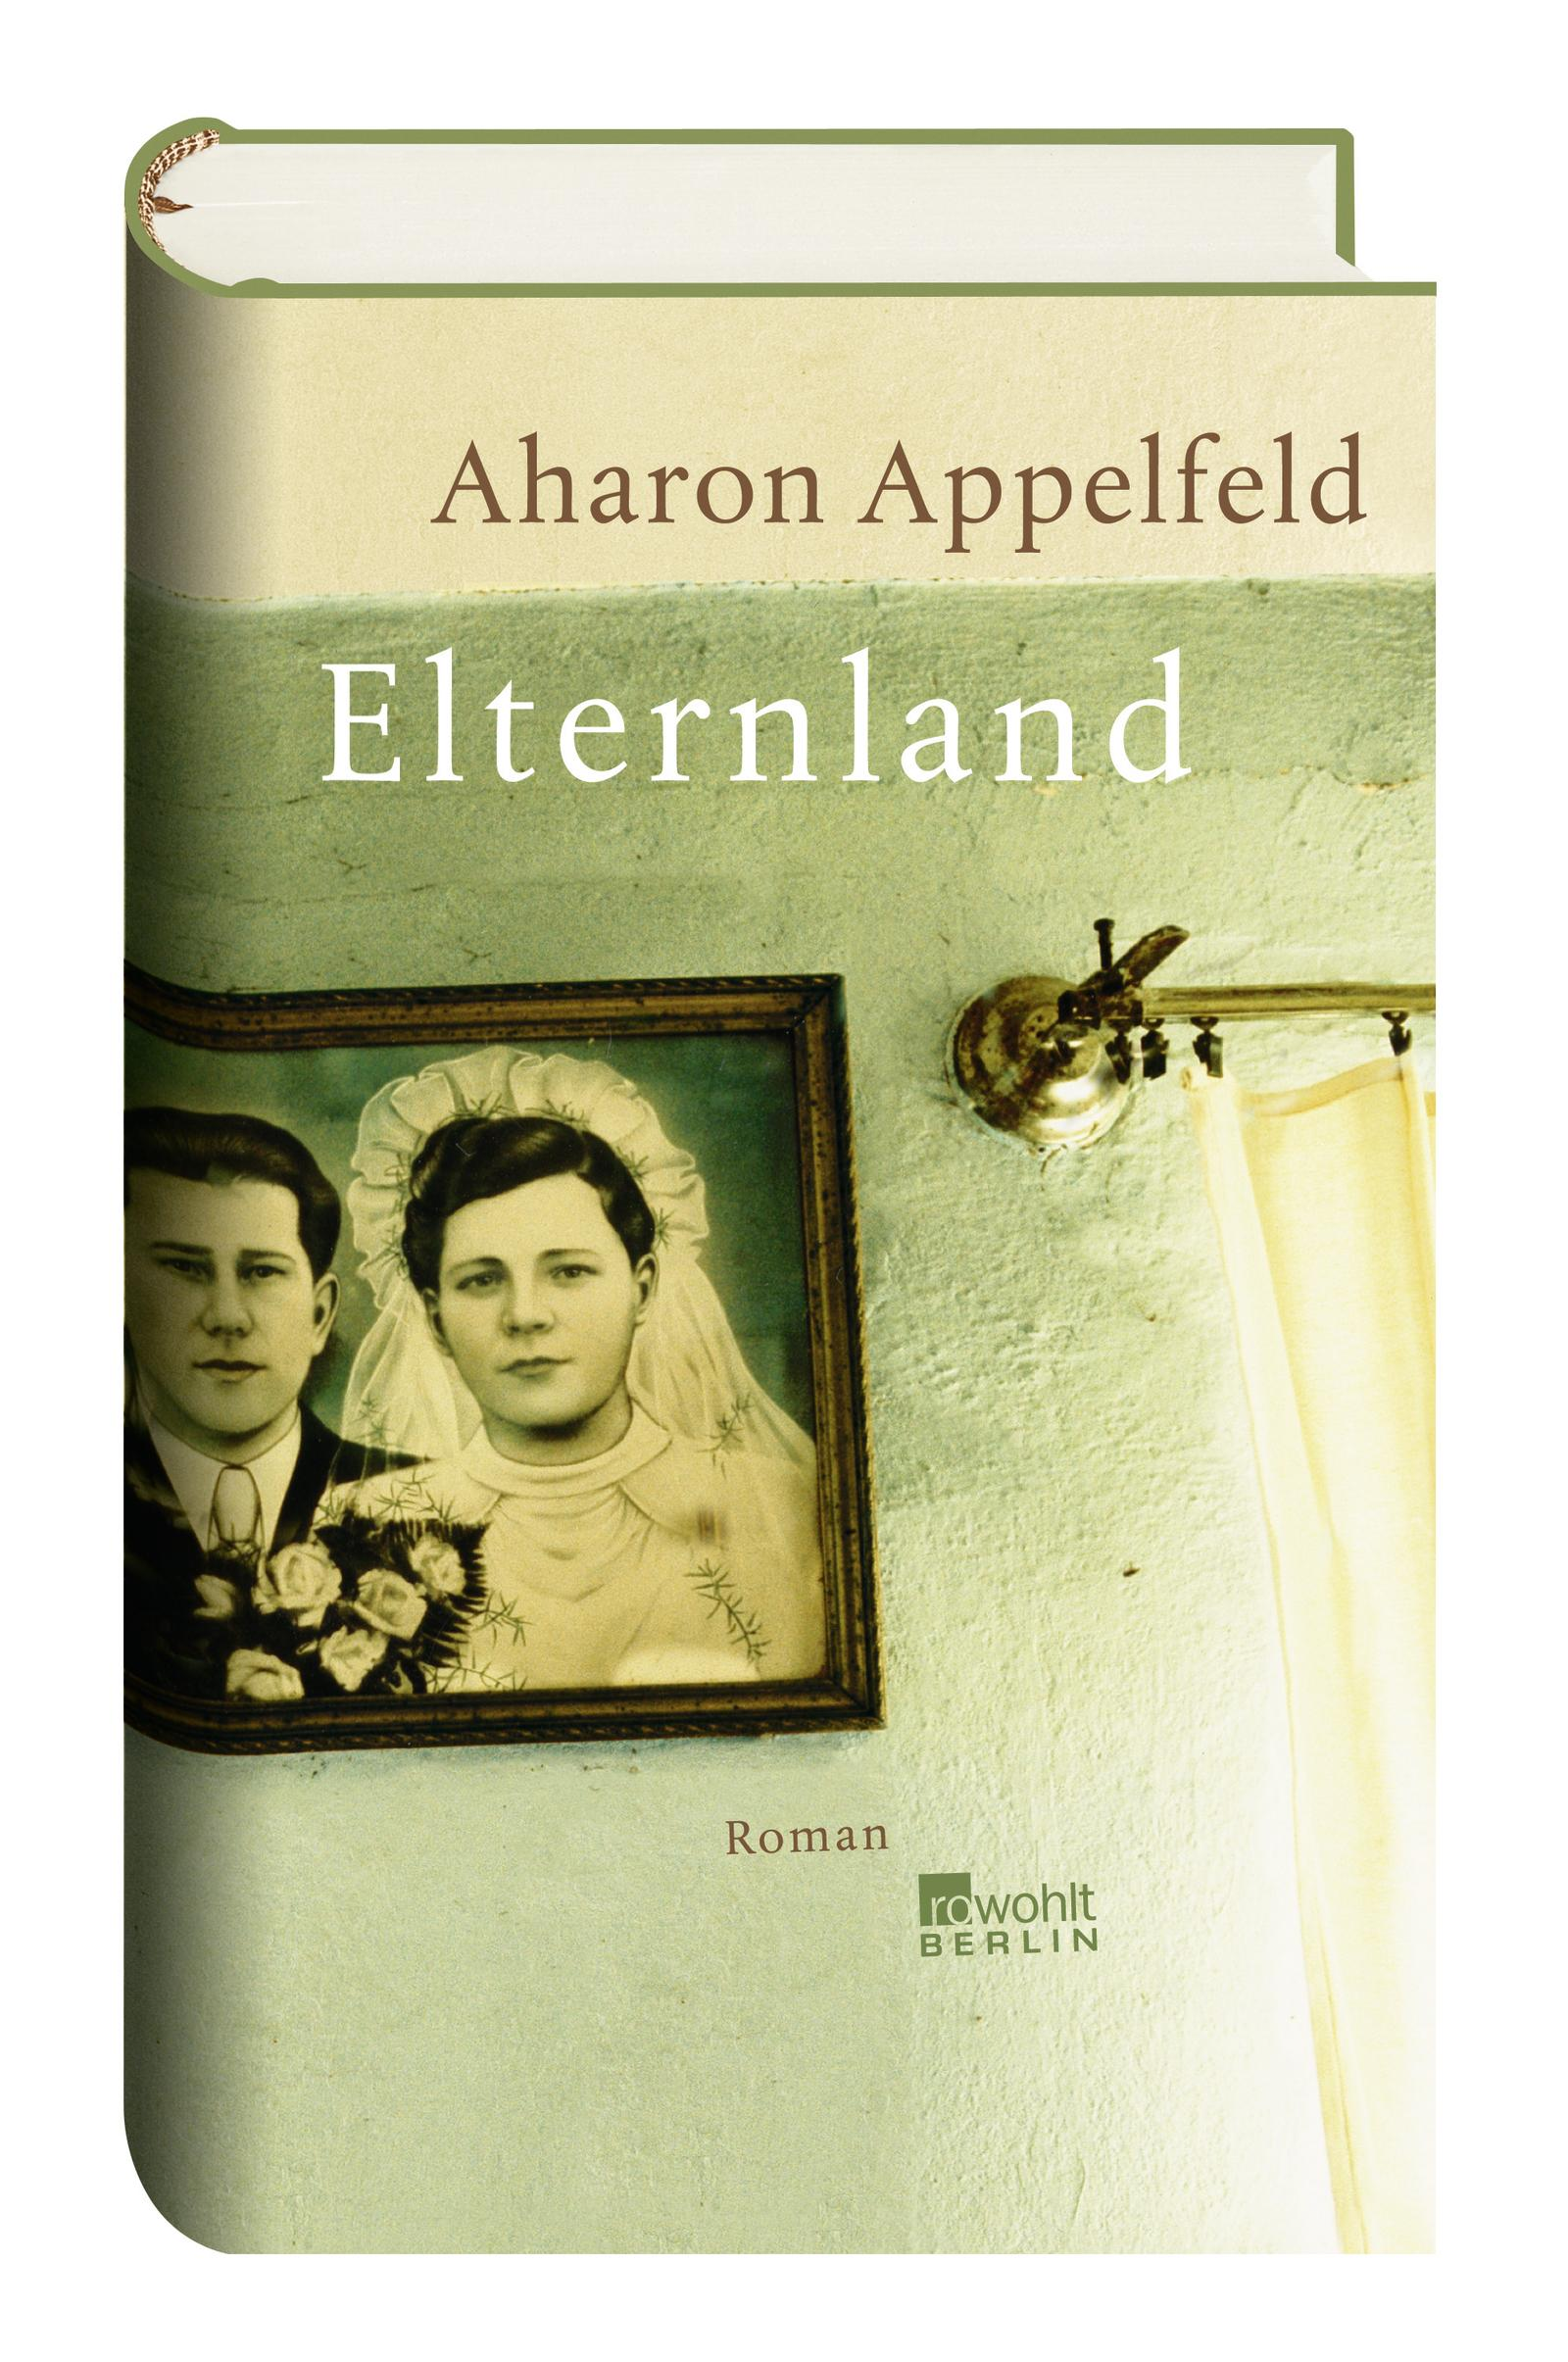 NEU Elternland Aharon Appelfeld 345517